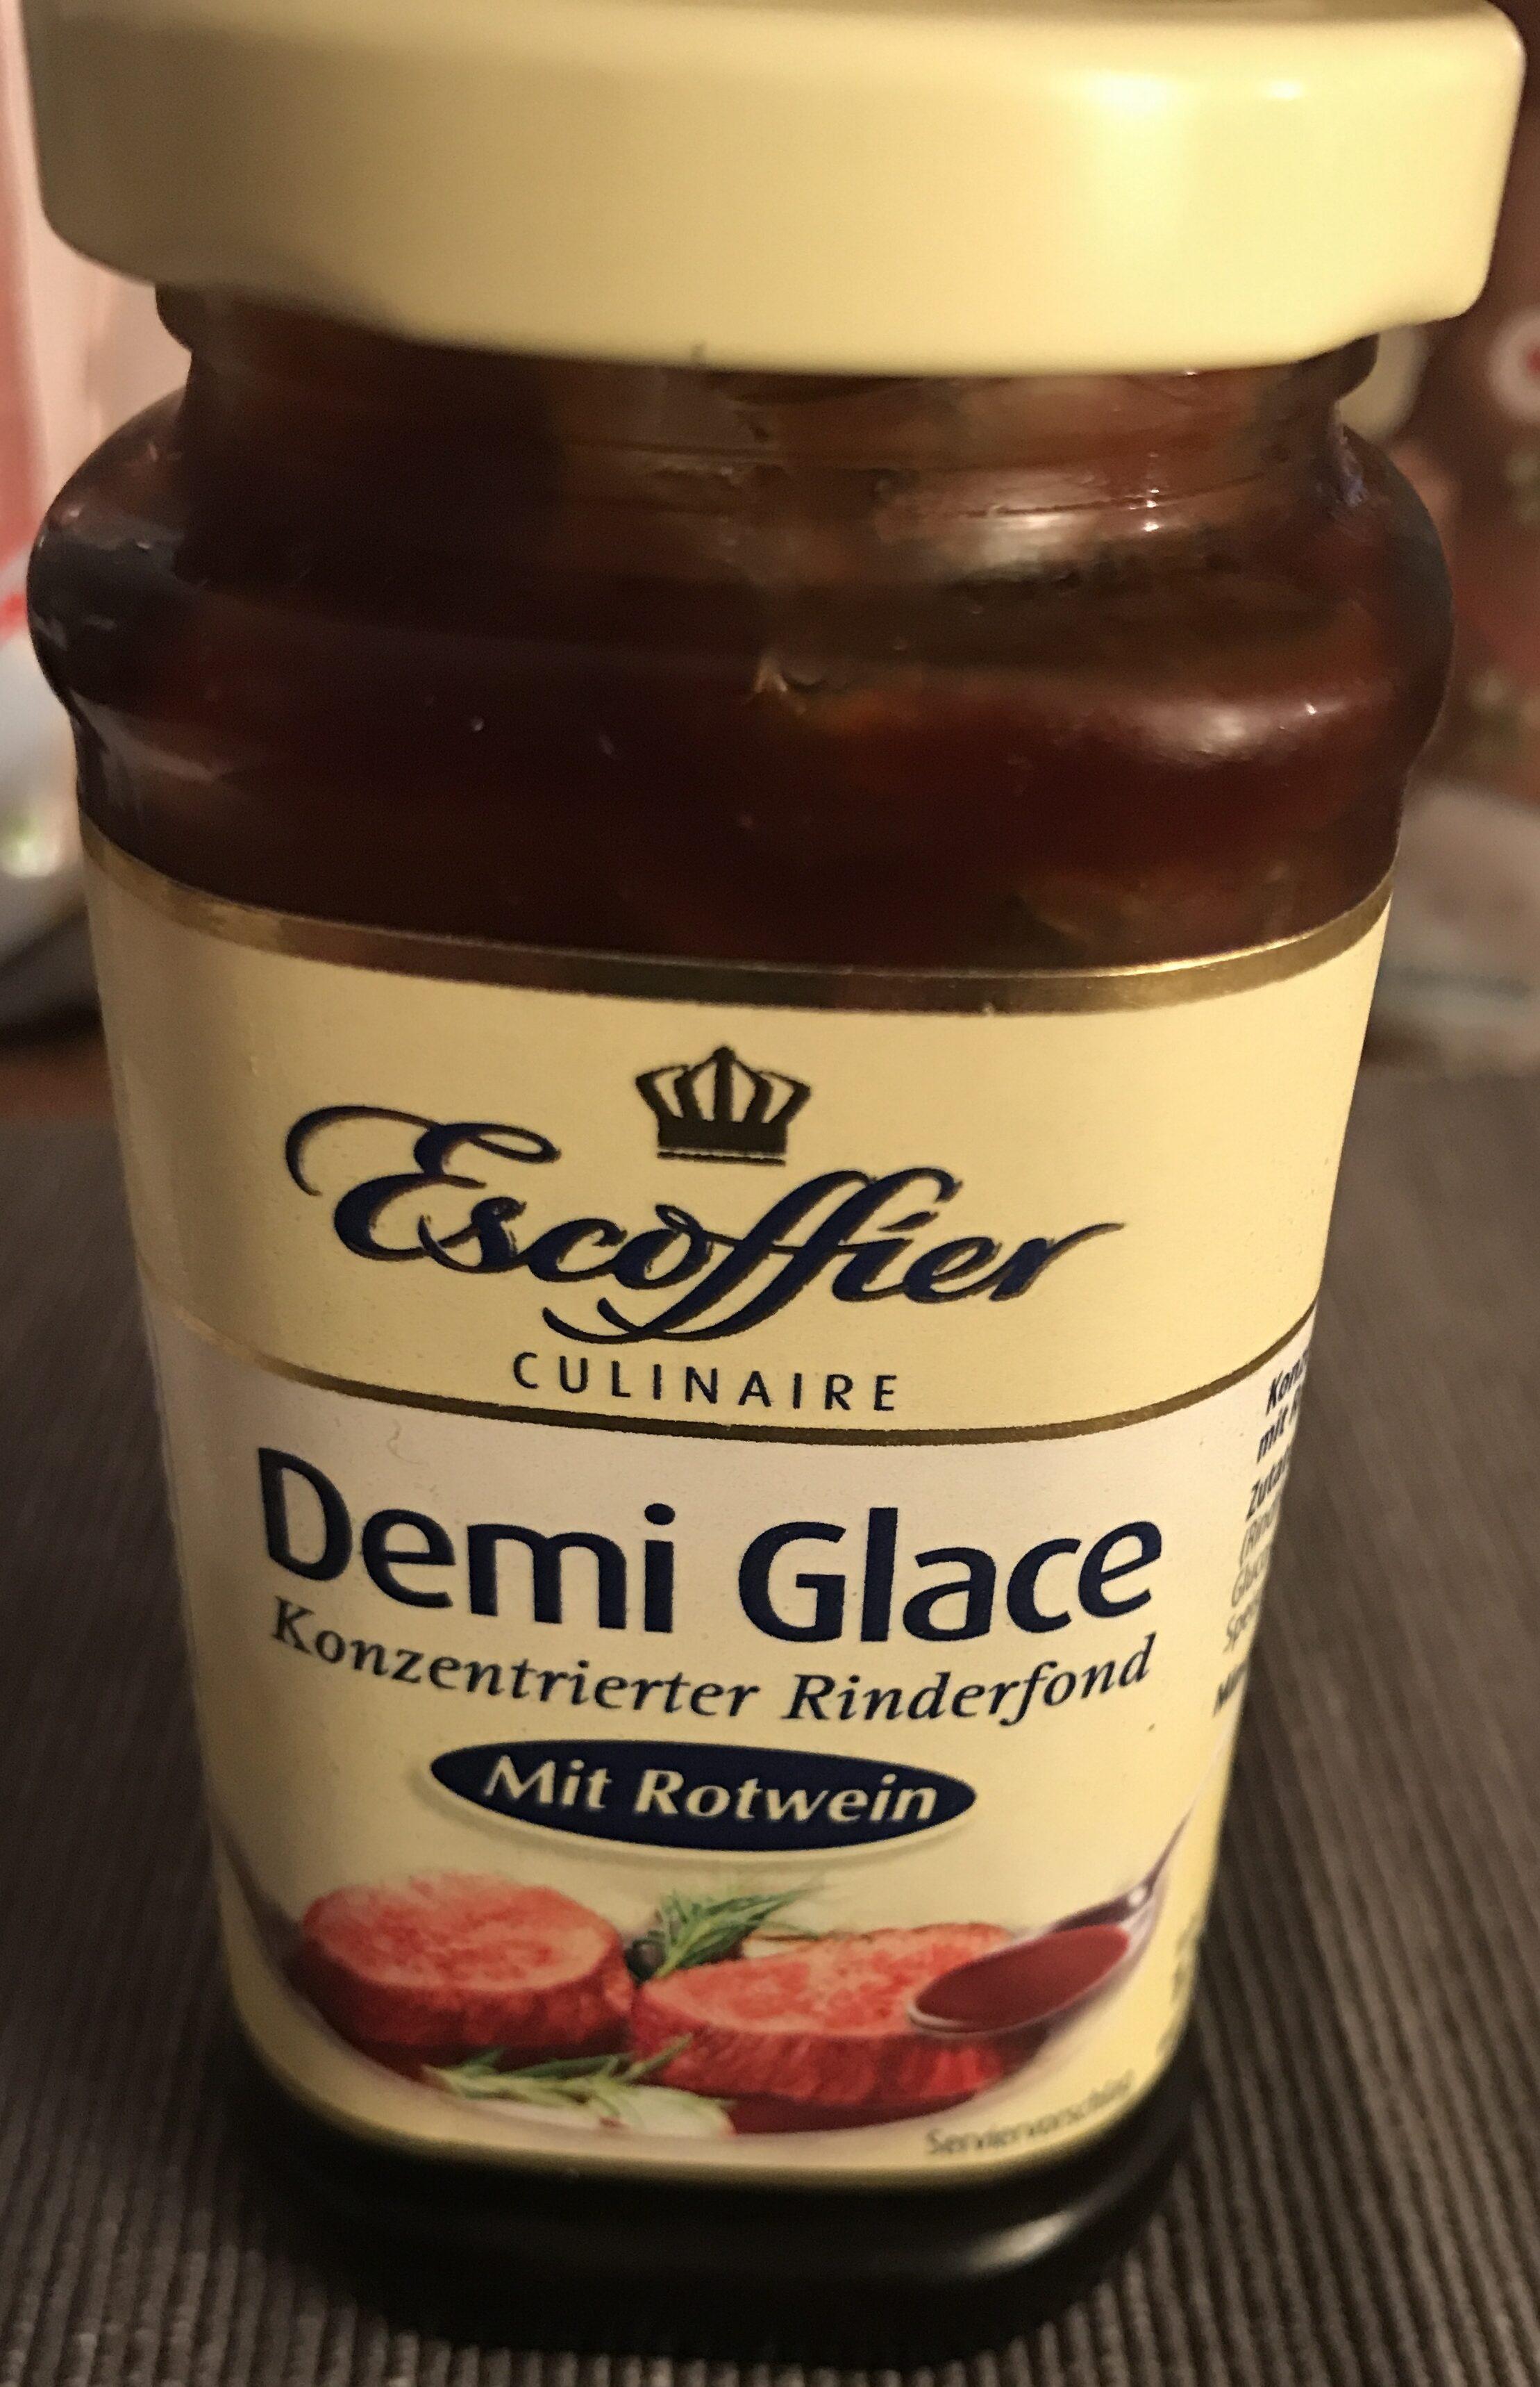 Demic Glace Konzentrierter Rinderfond - Product